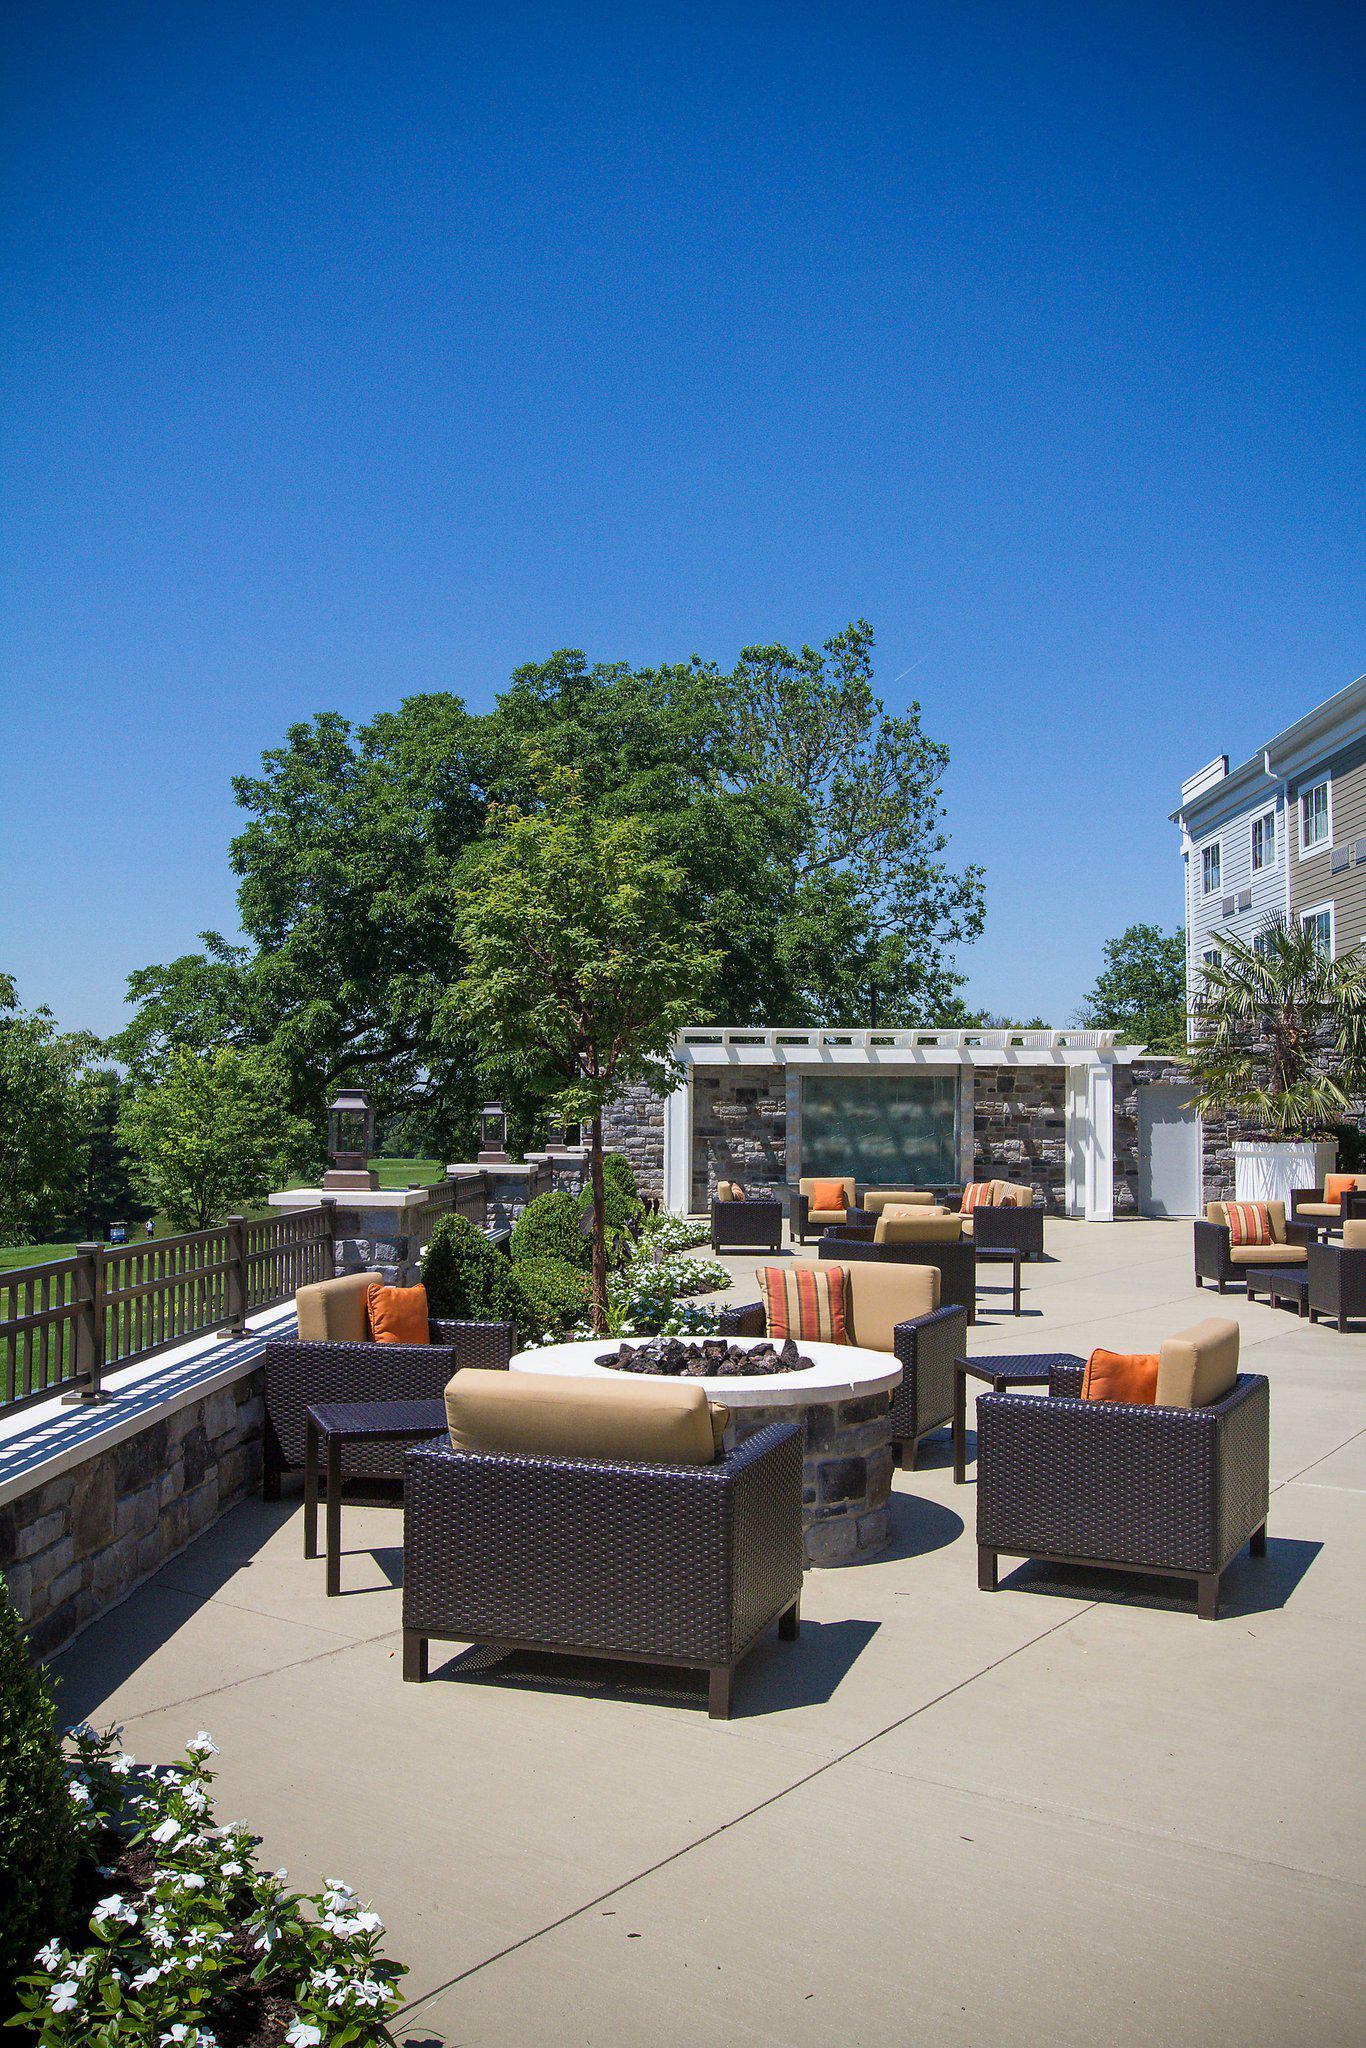 Courtyard by Marriott Philadelphia Springfield